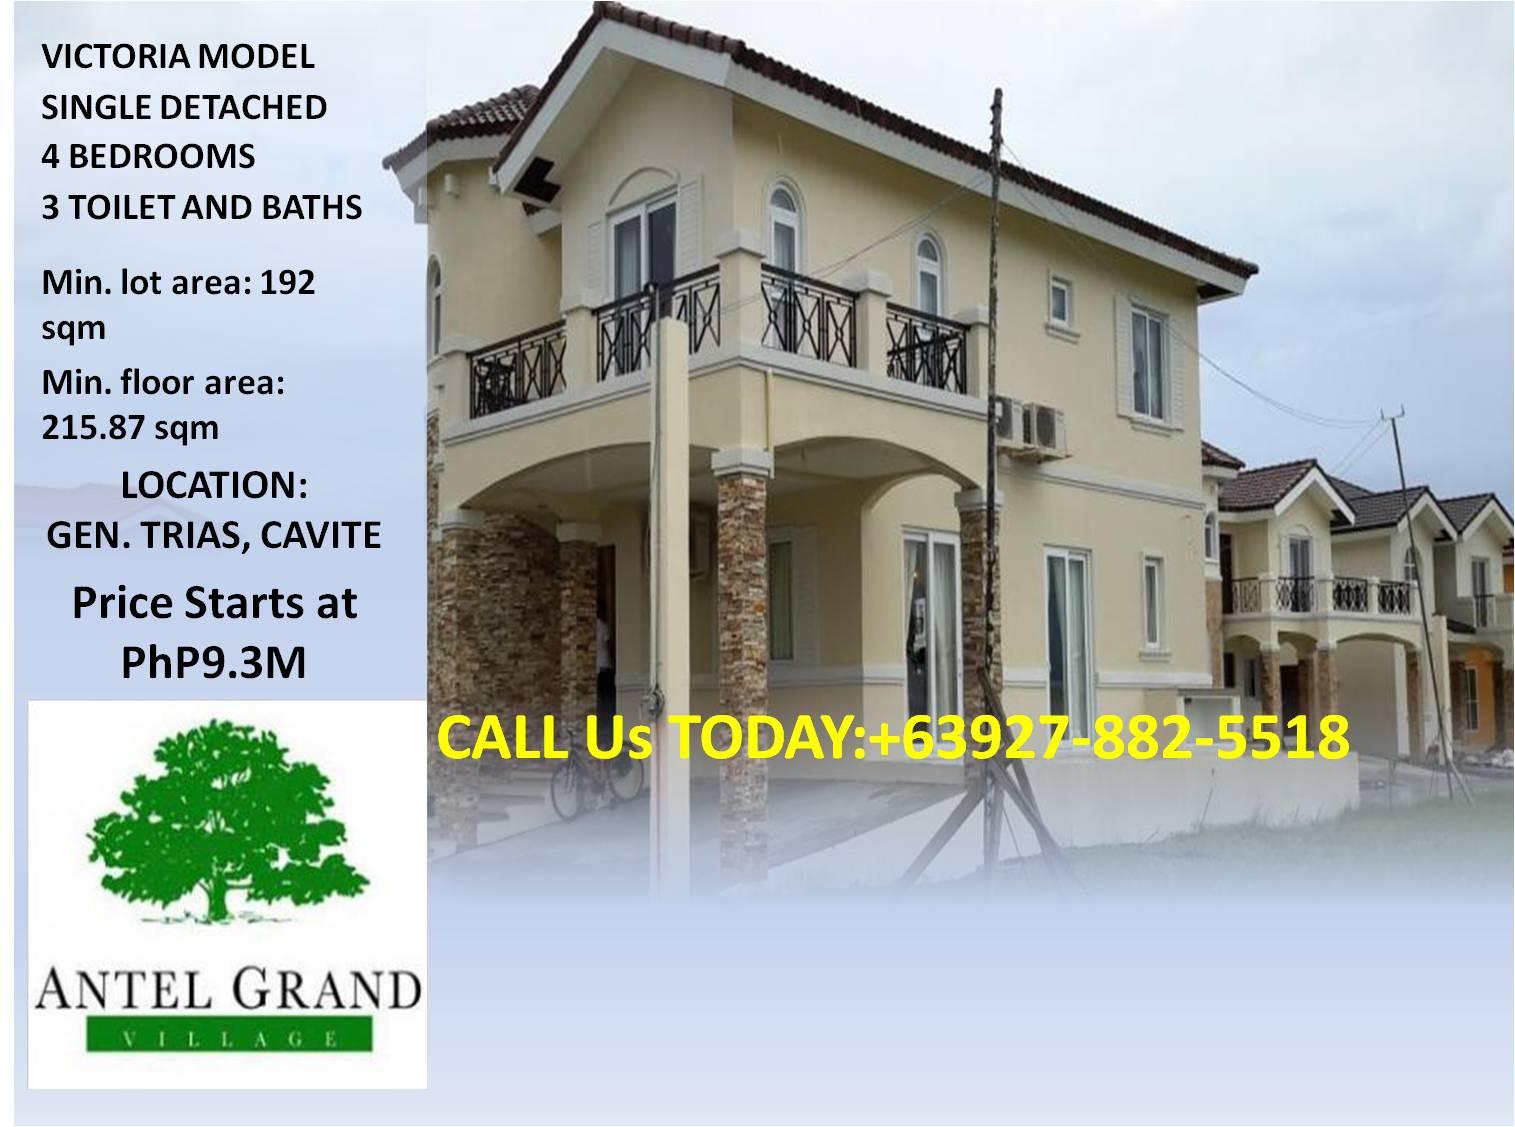 House design for 90 sqm lot - Modern House Design For 200 Square Meter Lot